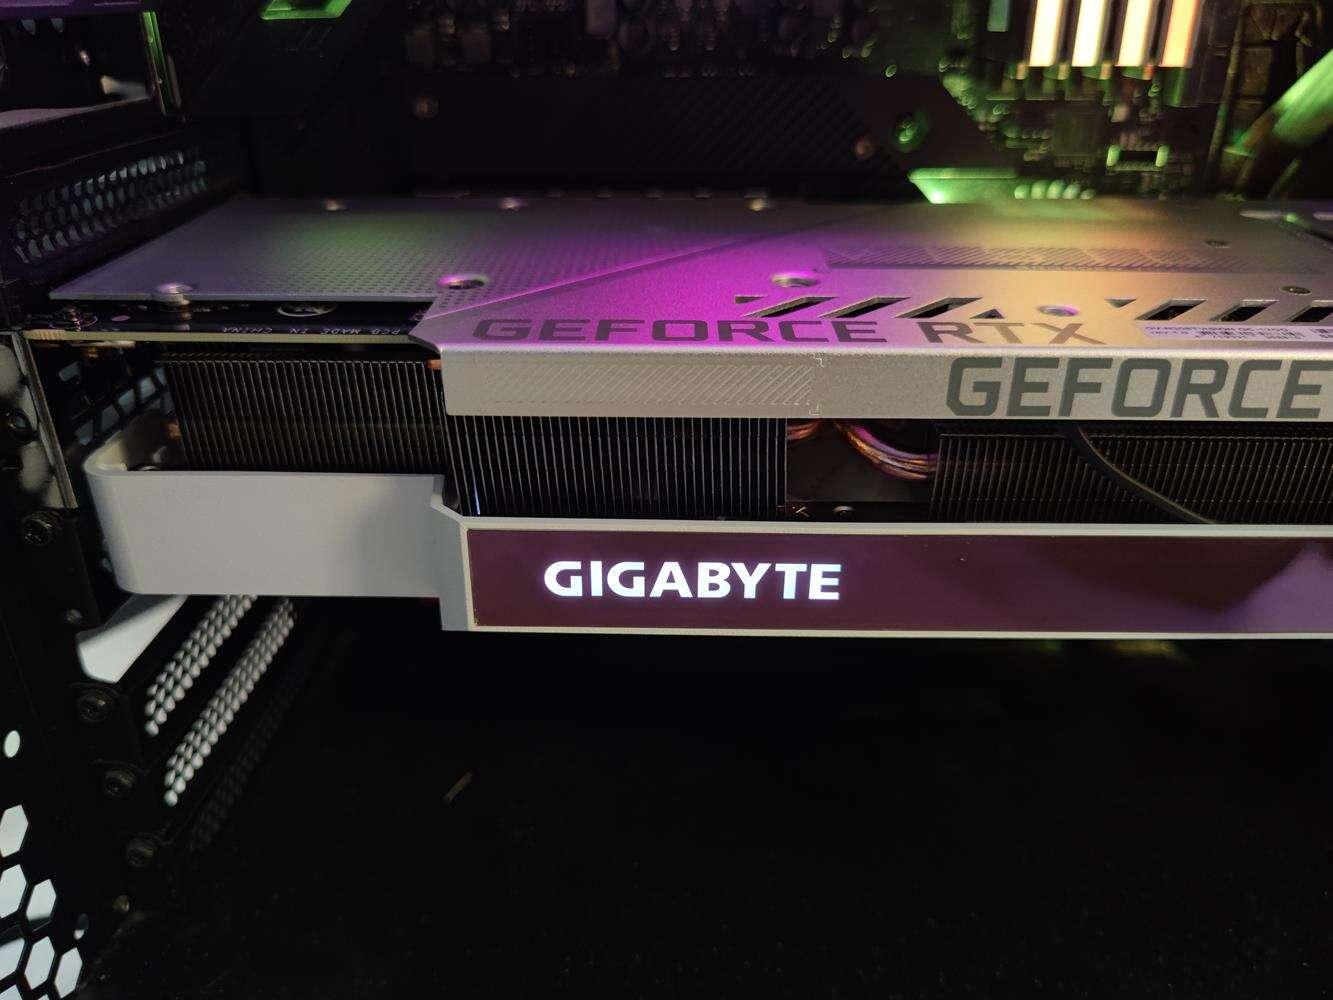 test Gigabyte GeForce RTX 3080 Ti Vision OC, recenzja Gigabyte GeForce RTX 3080 Ti Vision OC, opinia Gigabyte GeForce RTX 3080 Ti Vision OC